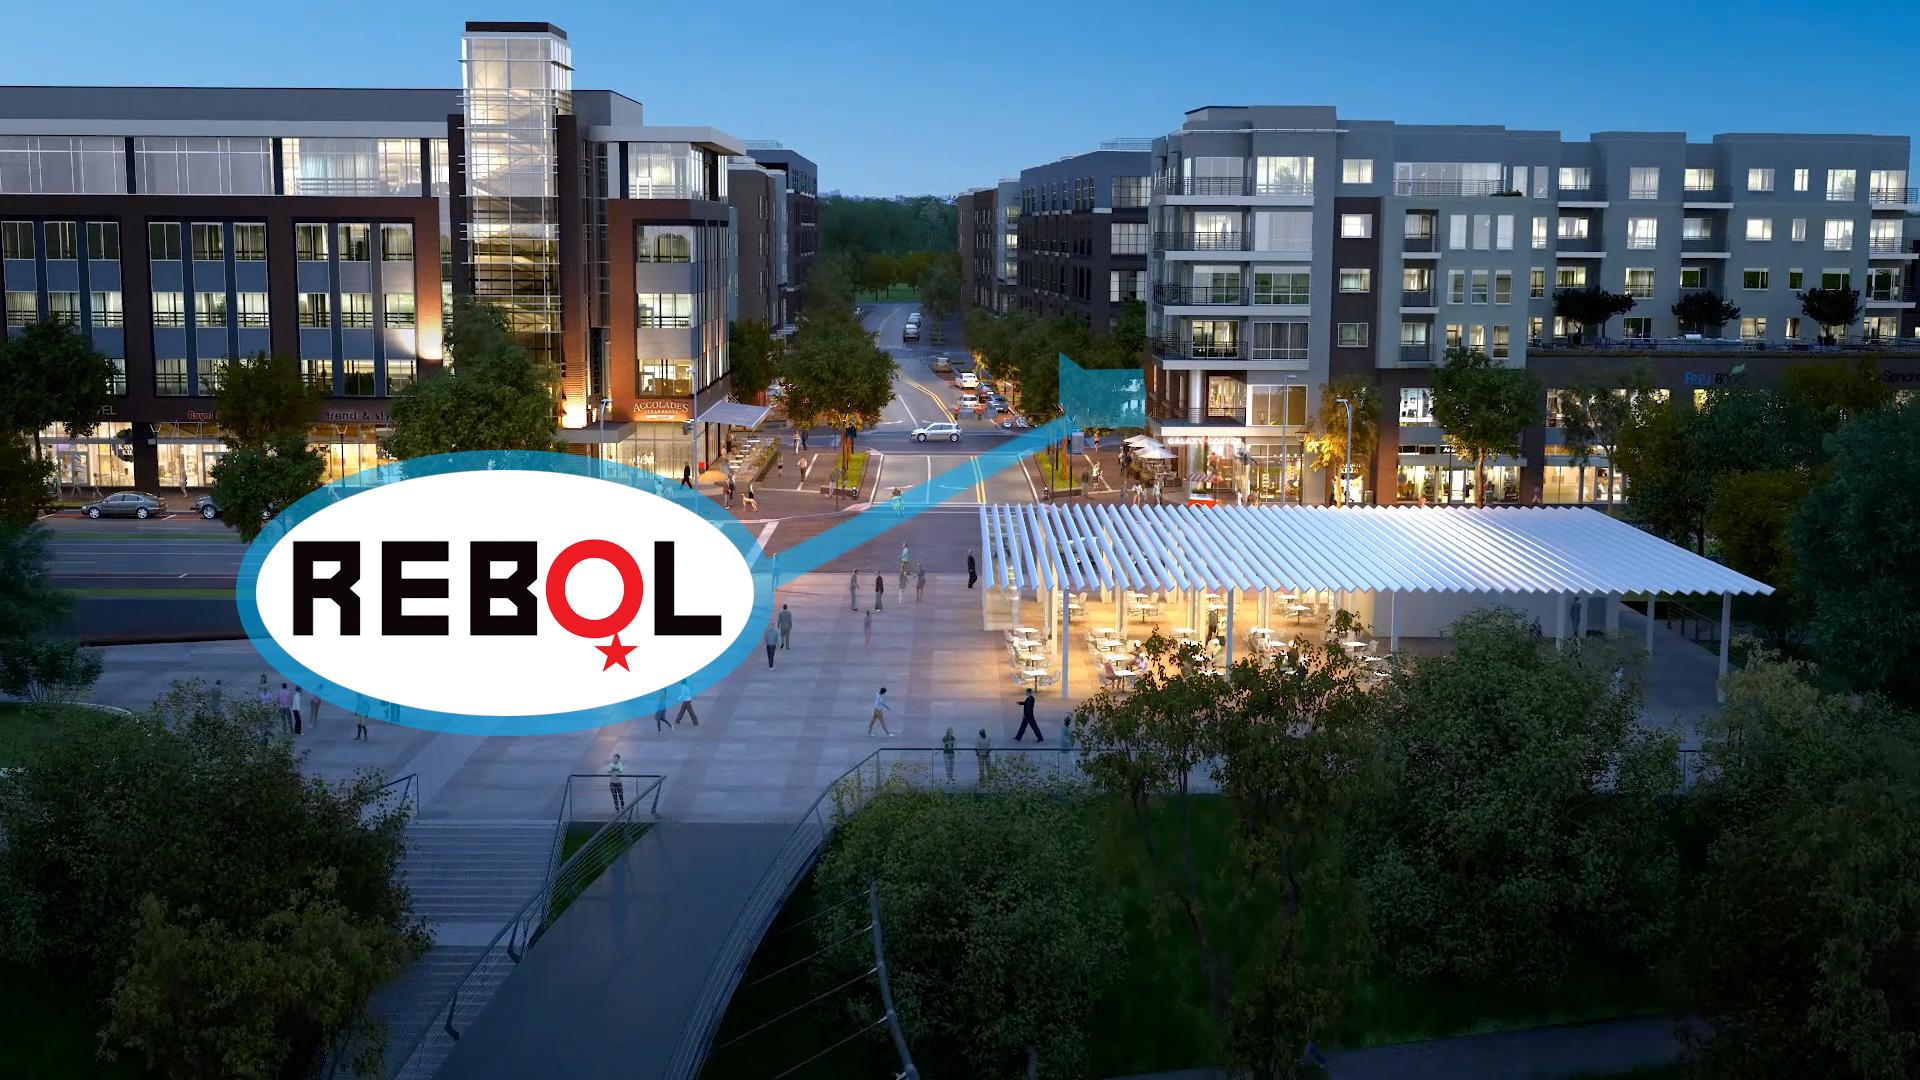 Rebol-Street-View.jpg